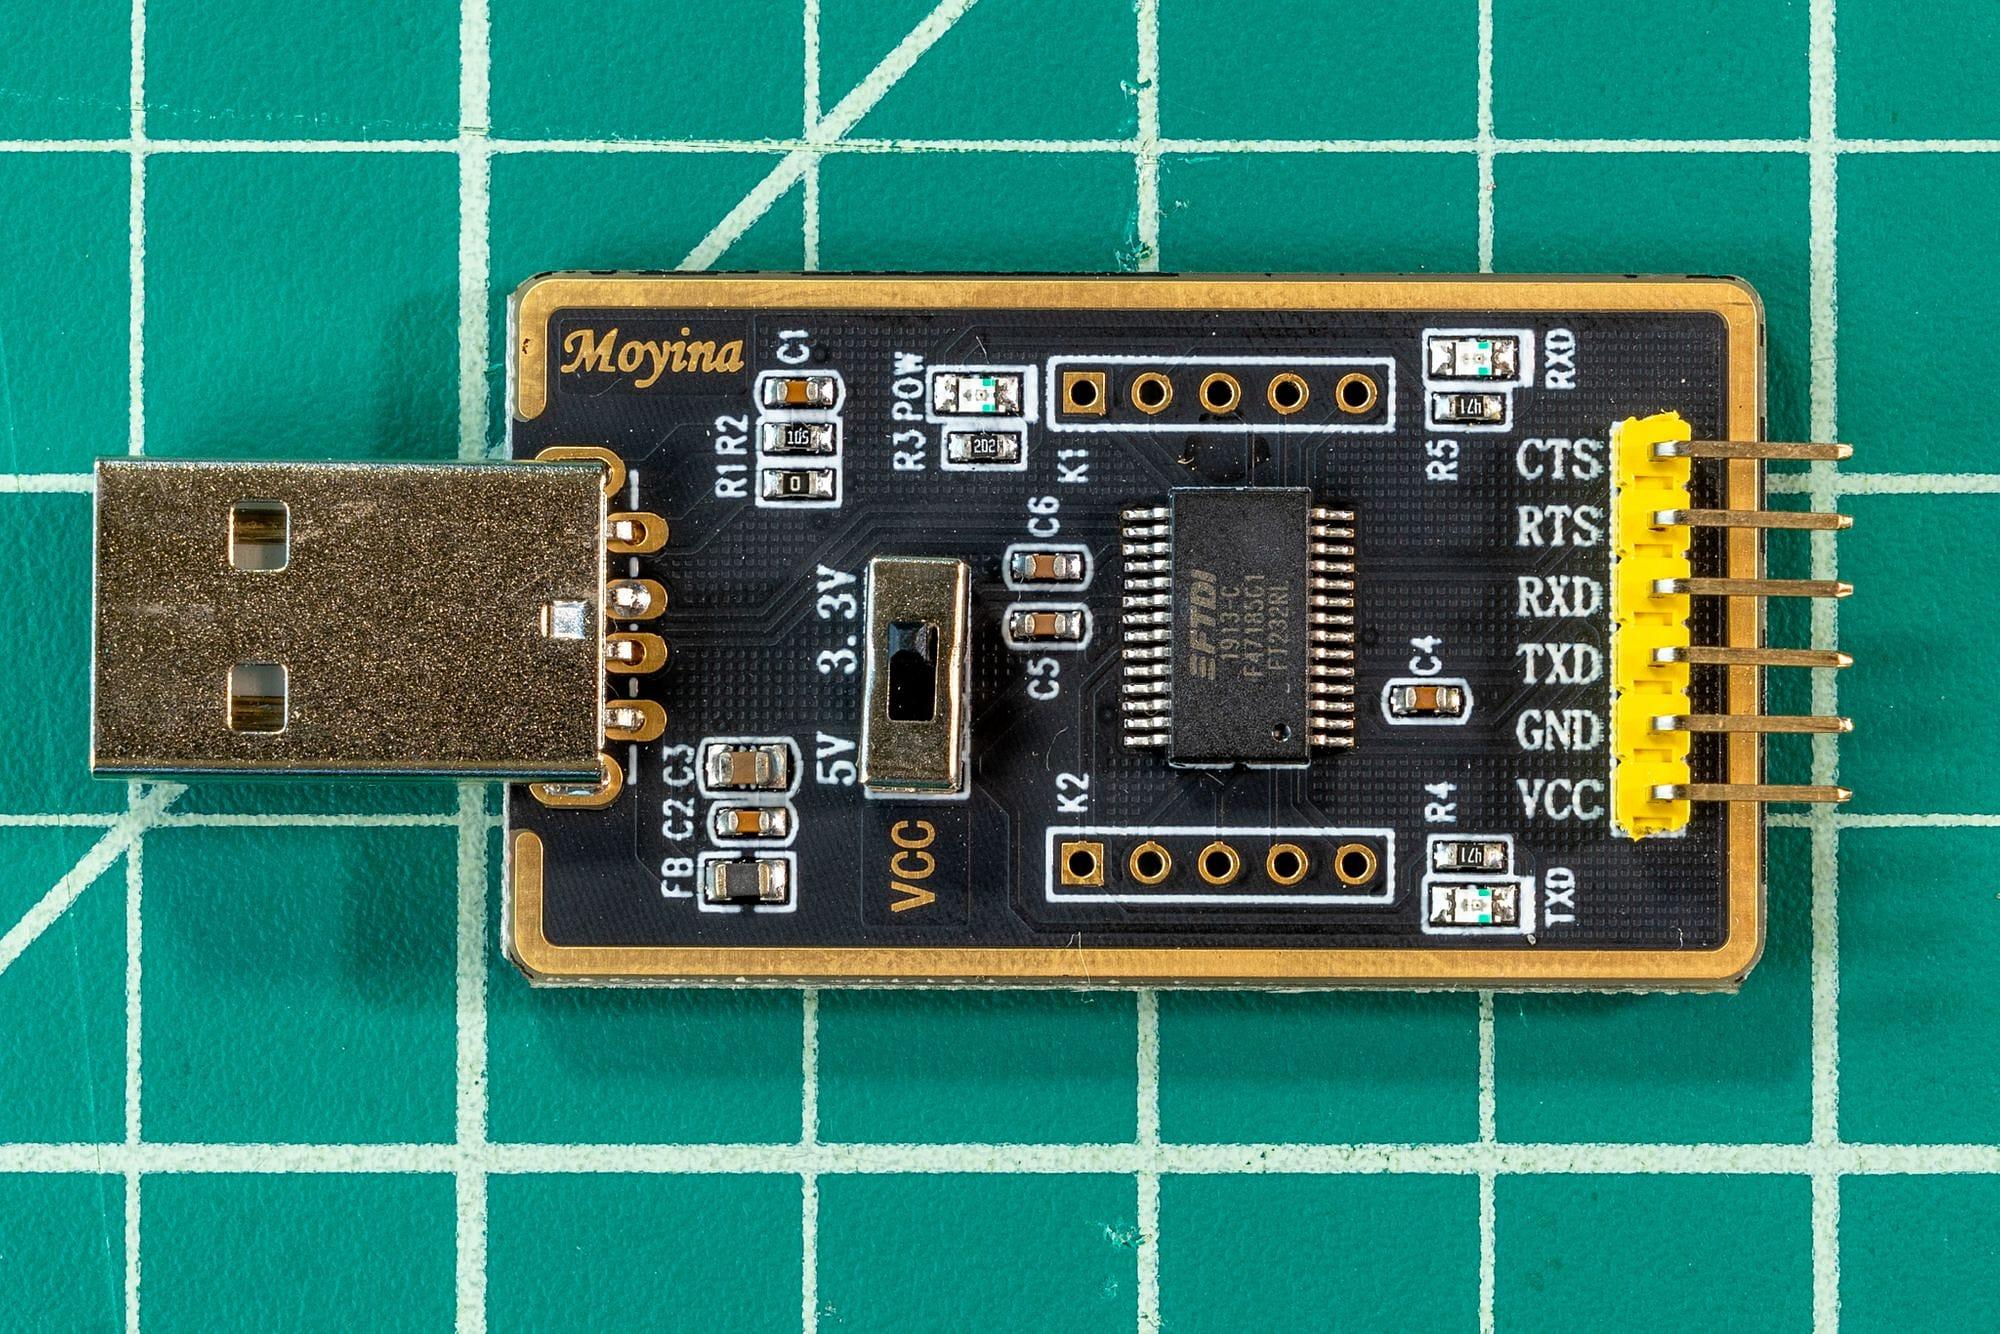 Moyina FTDI USB Adapter